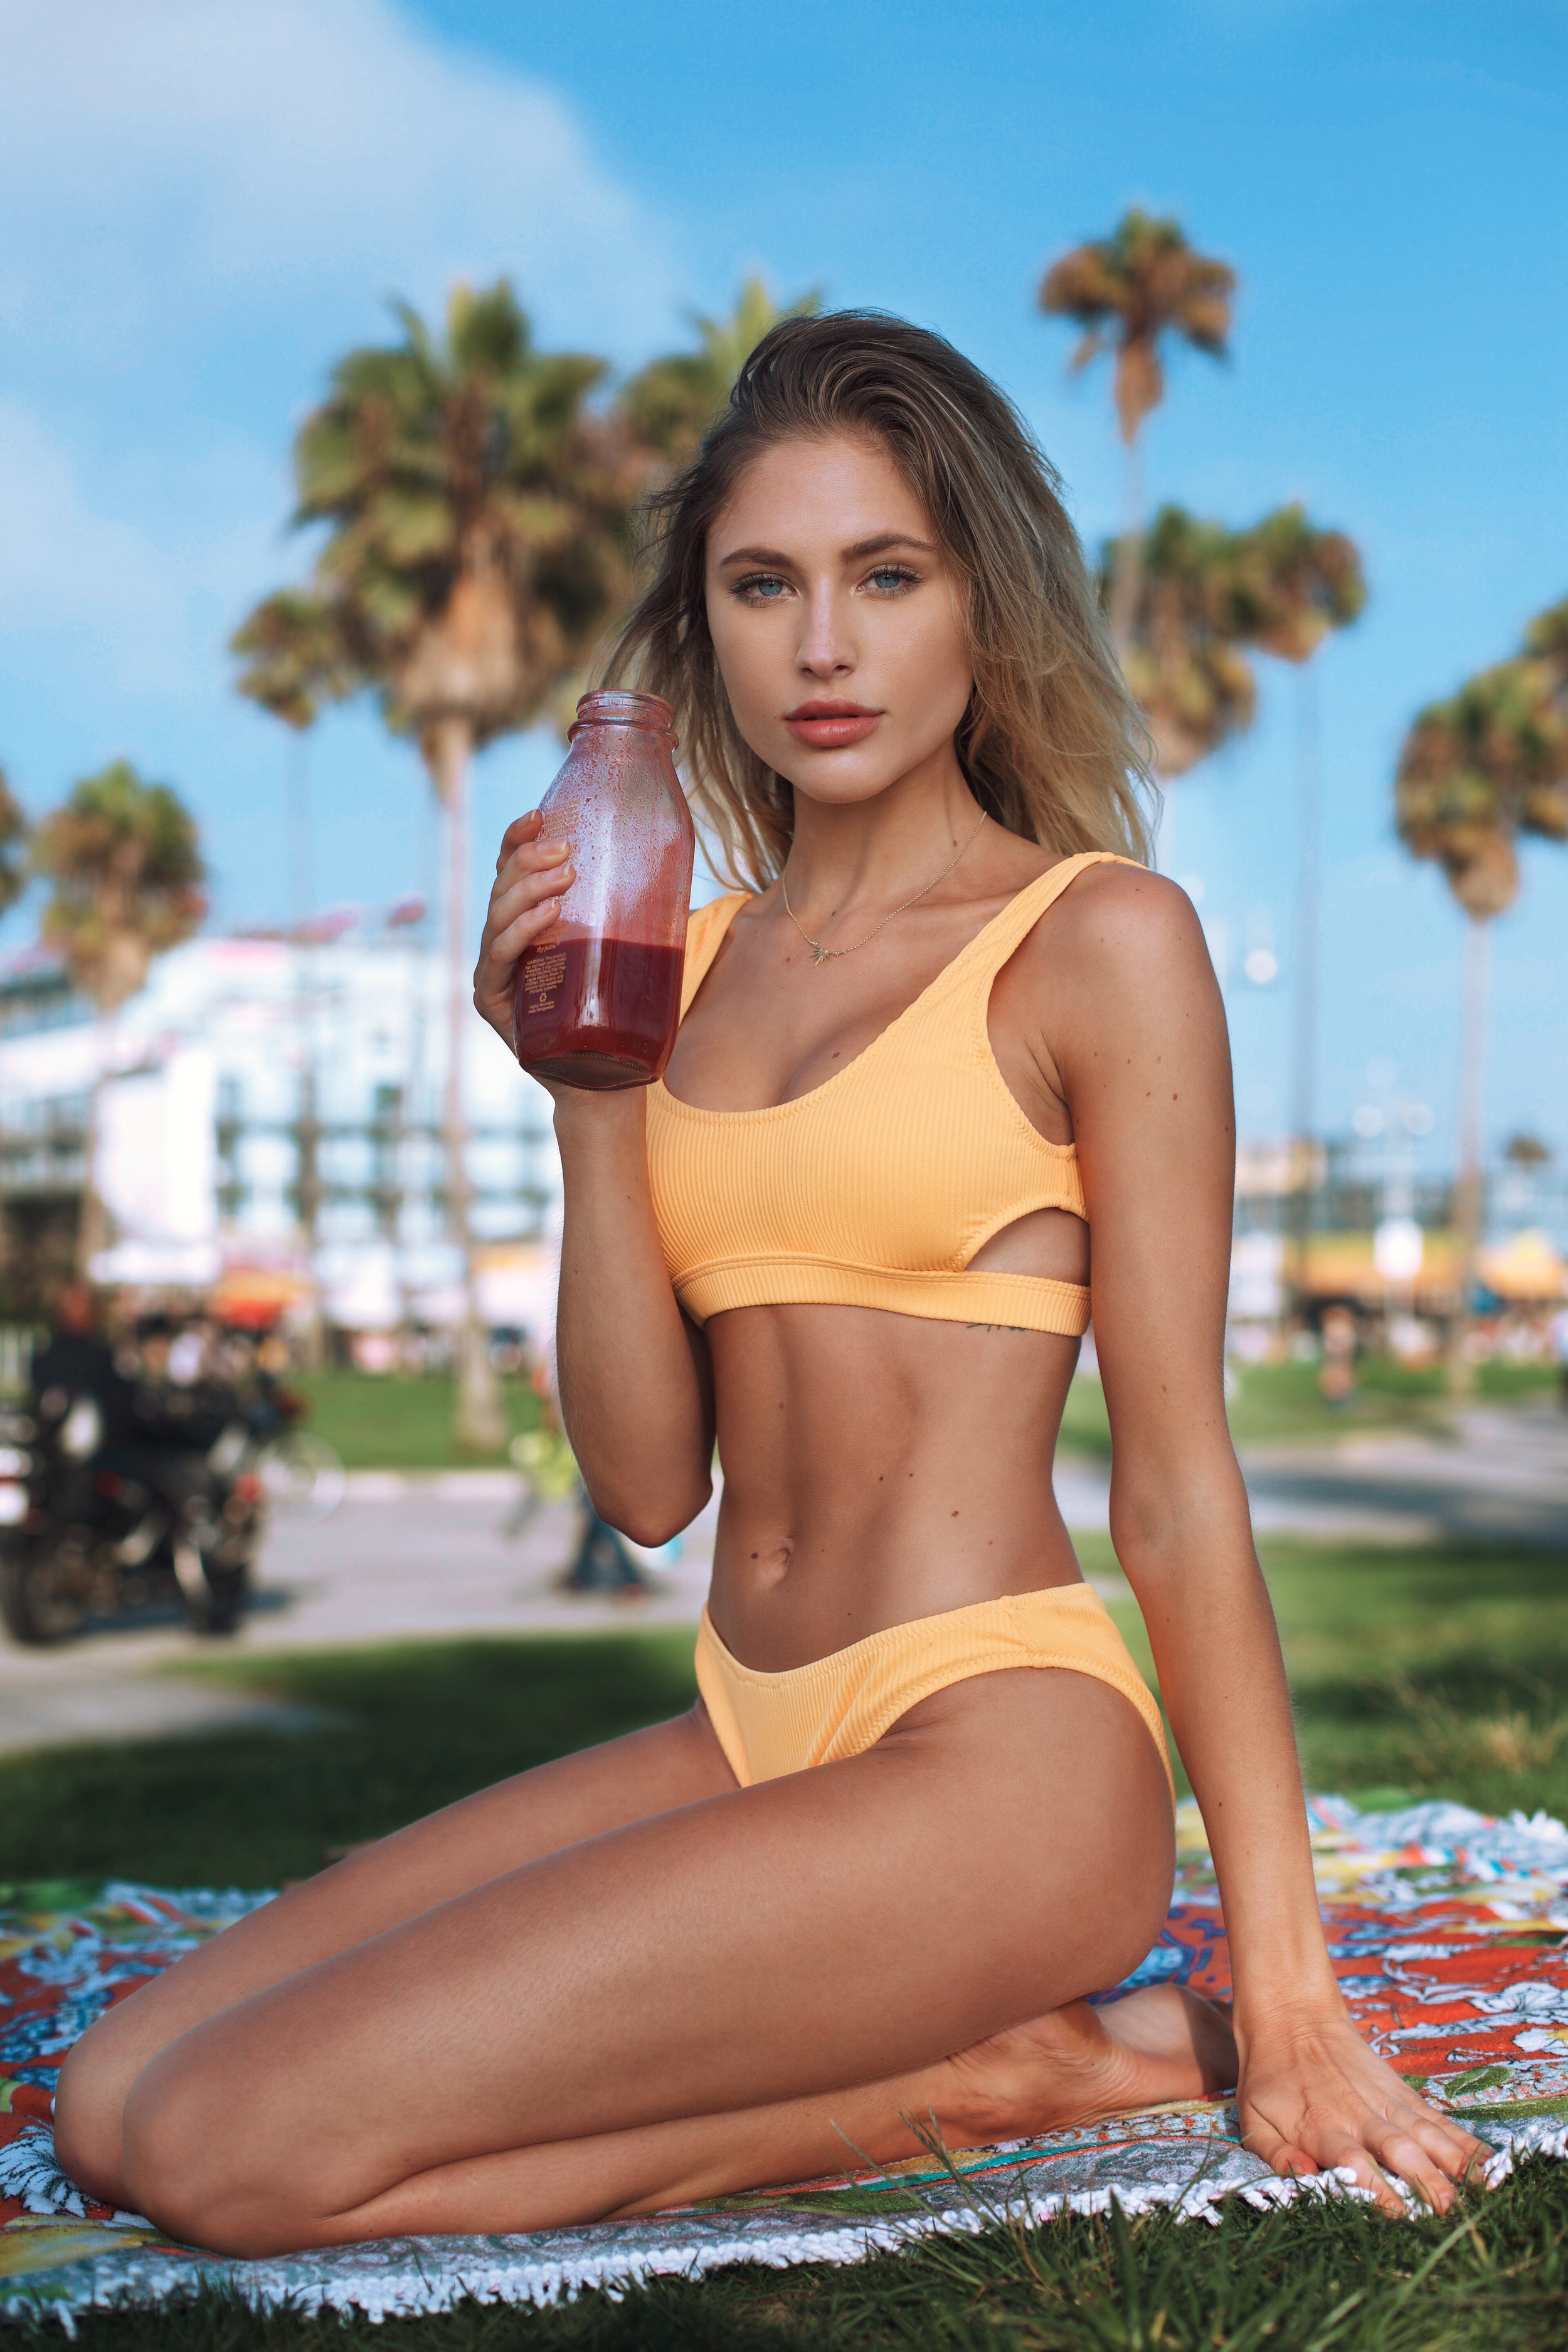 SHOP MY LOOK: Bikini:   $23 Cupshe.